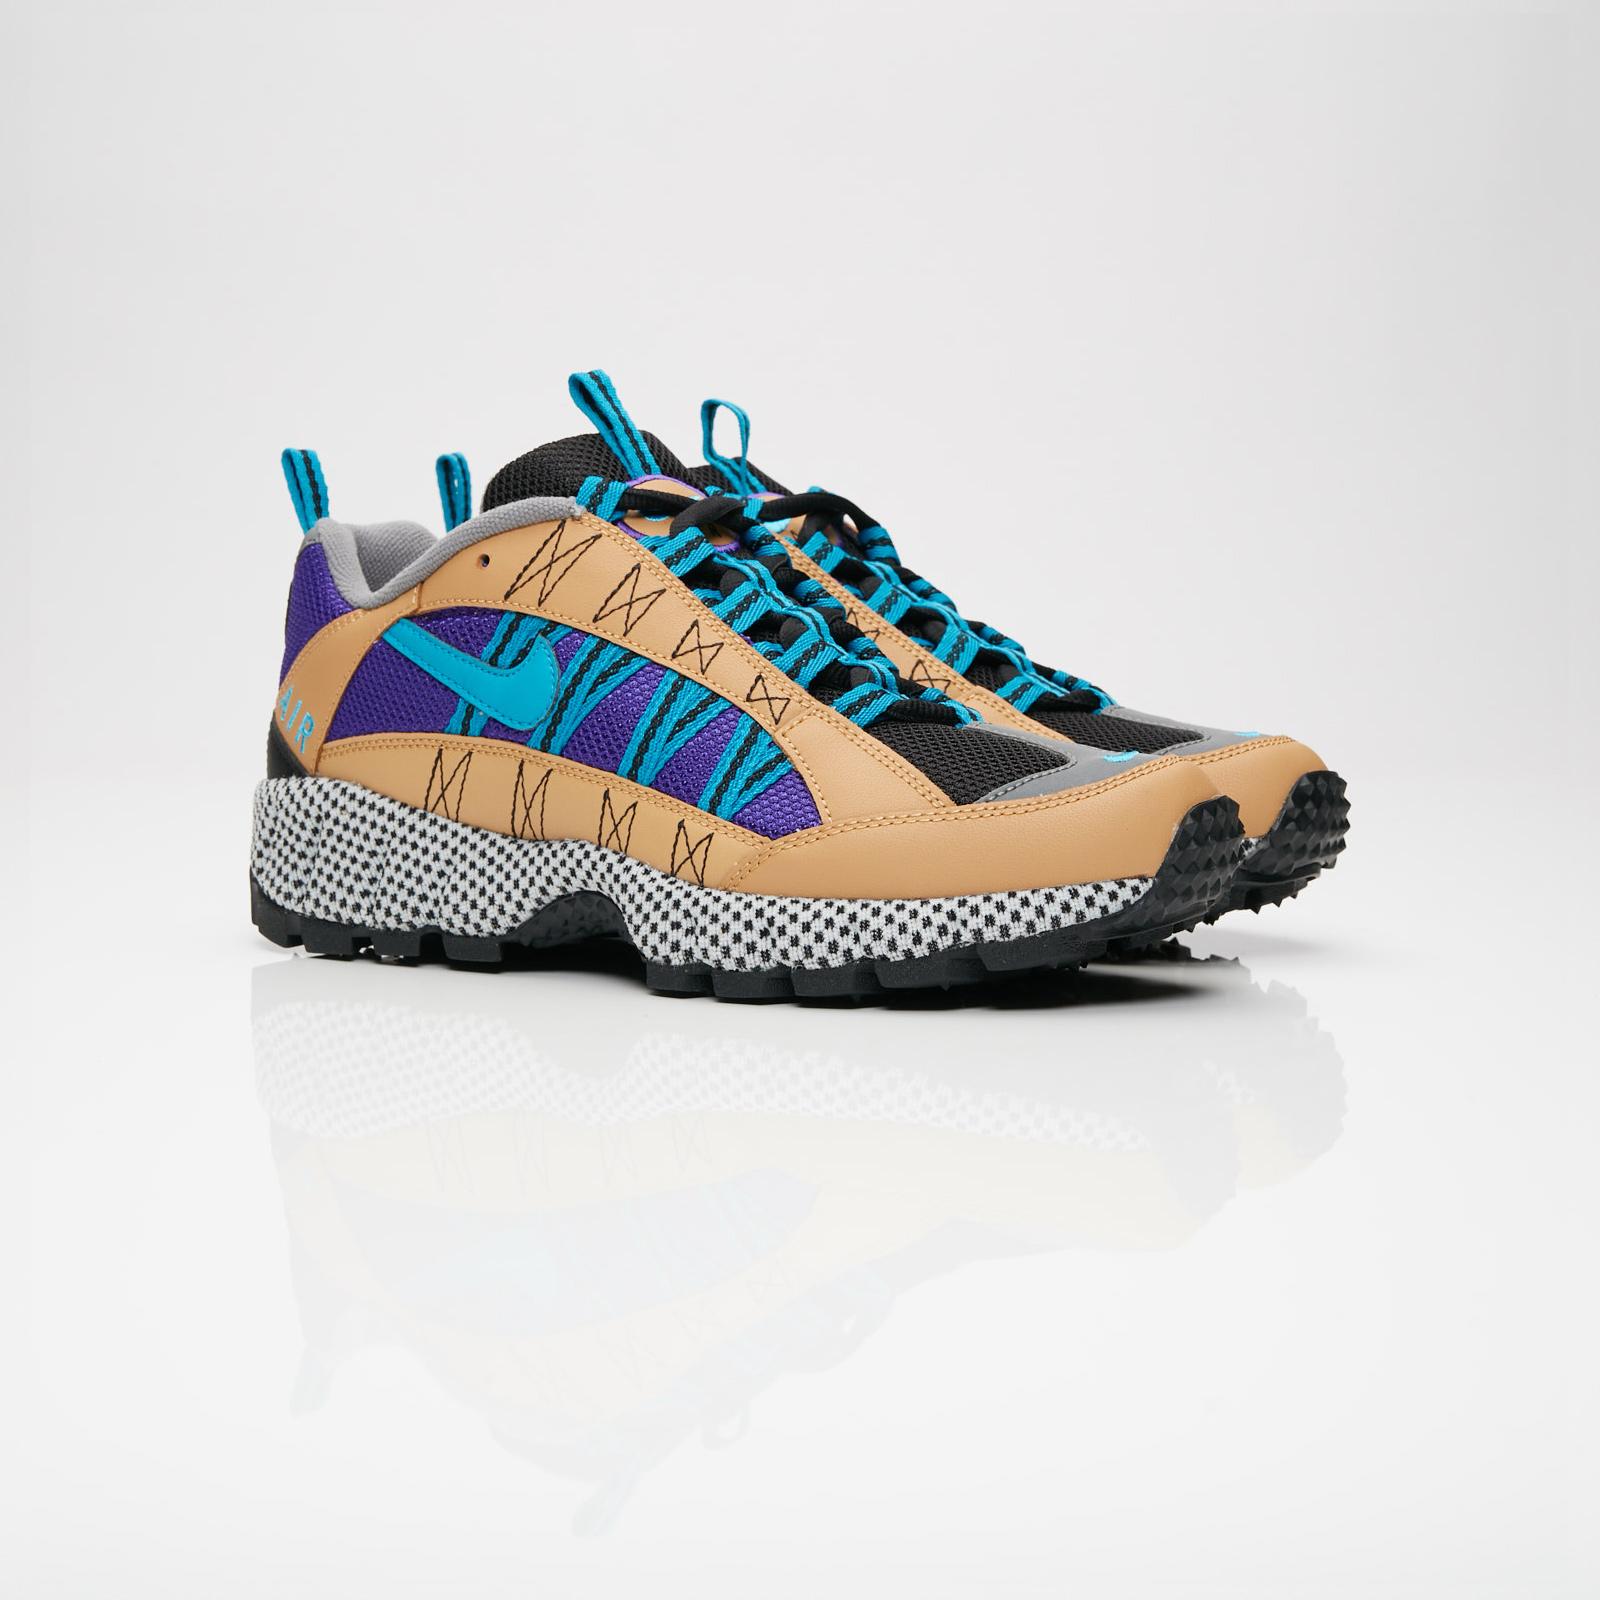 Air Sneakers Nike 17 700 Ao3297 Sneakersnstuff Qs Humara dBBWq0